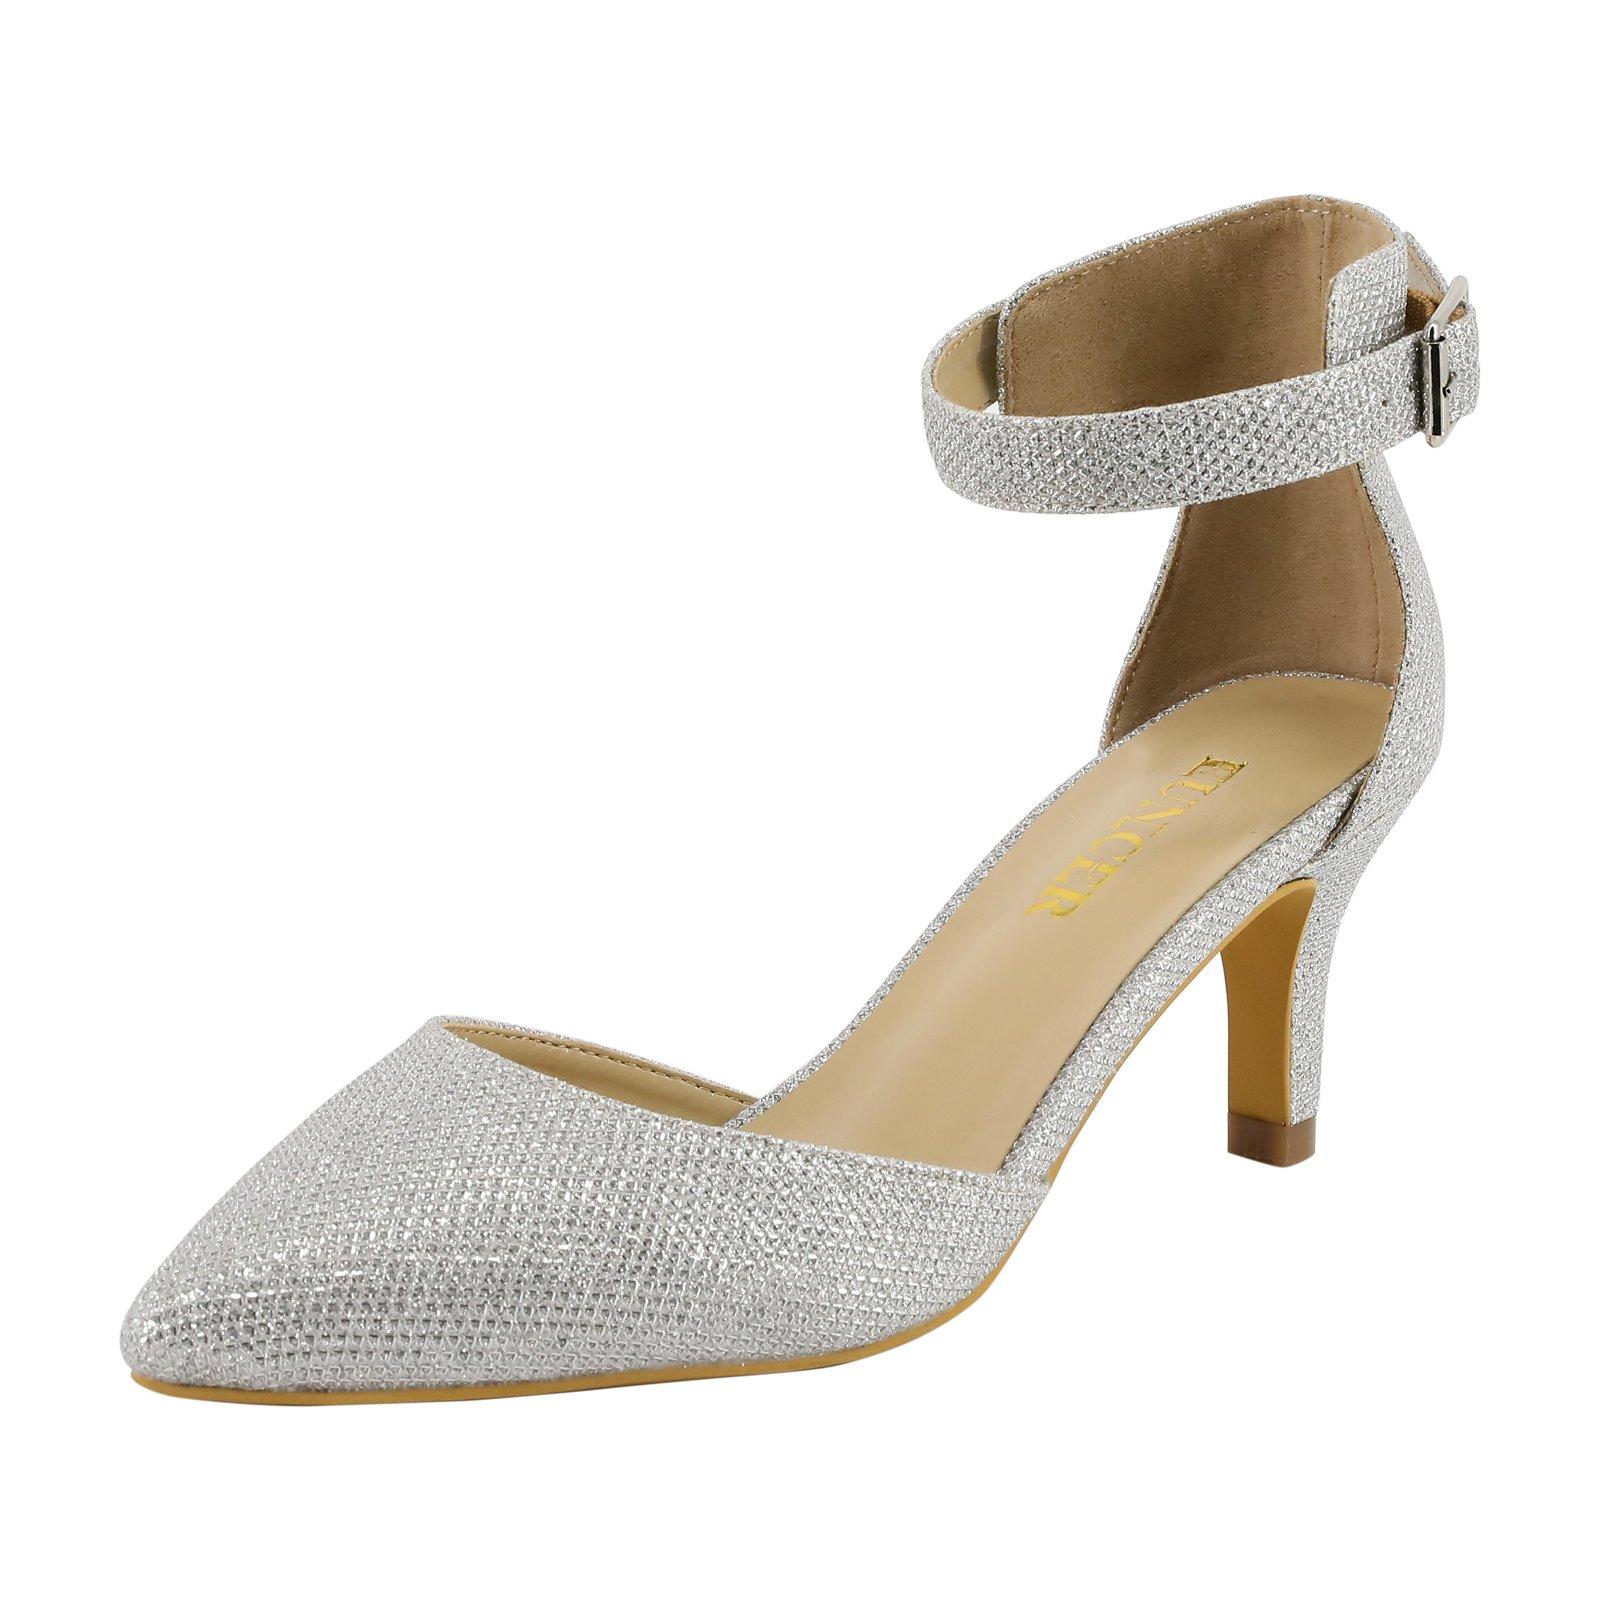 Eunicer Women's Ankle Strap Low Heel Stiletto Dress Pump Shoes Silver Glitter